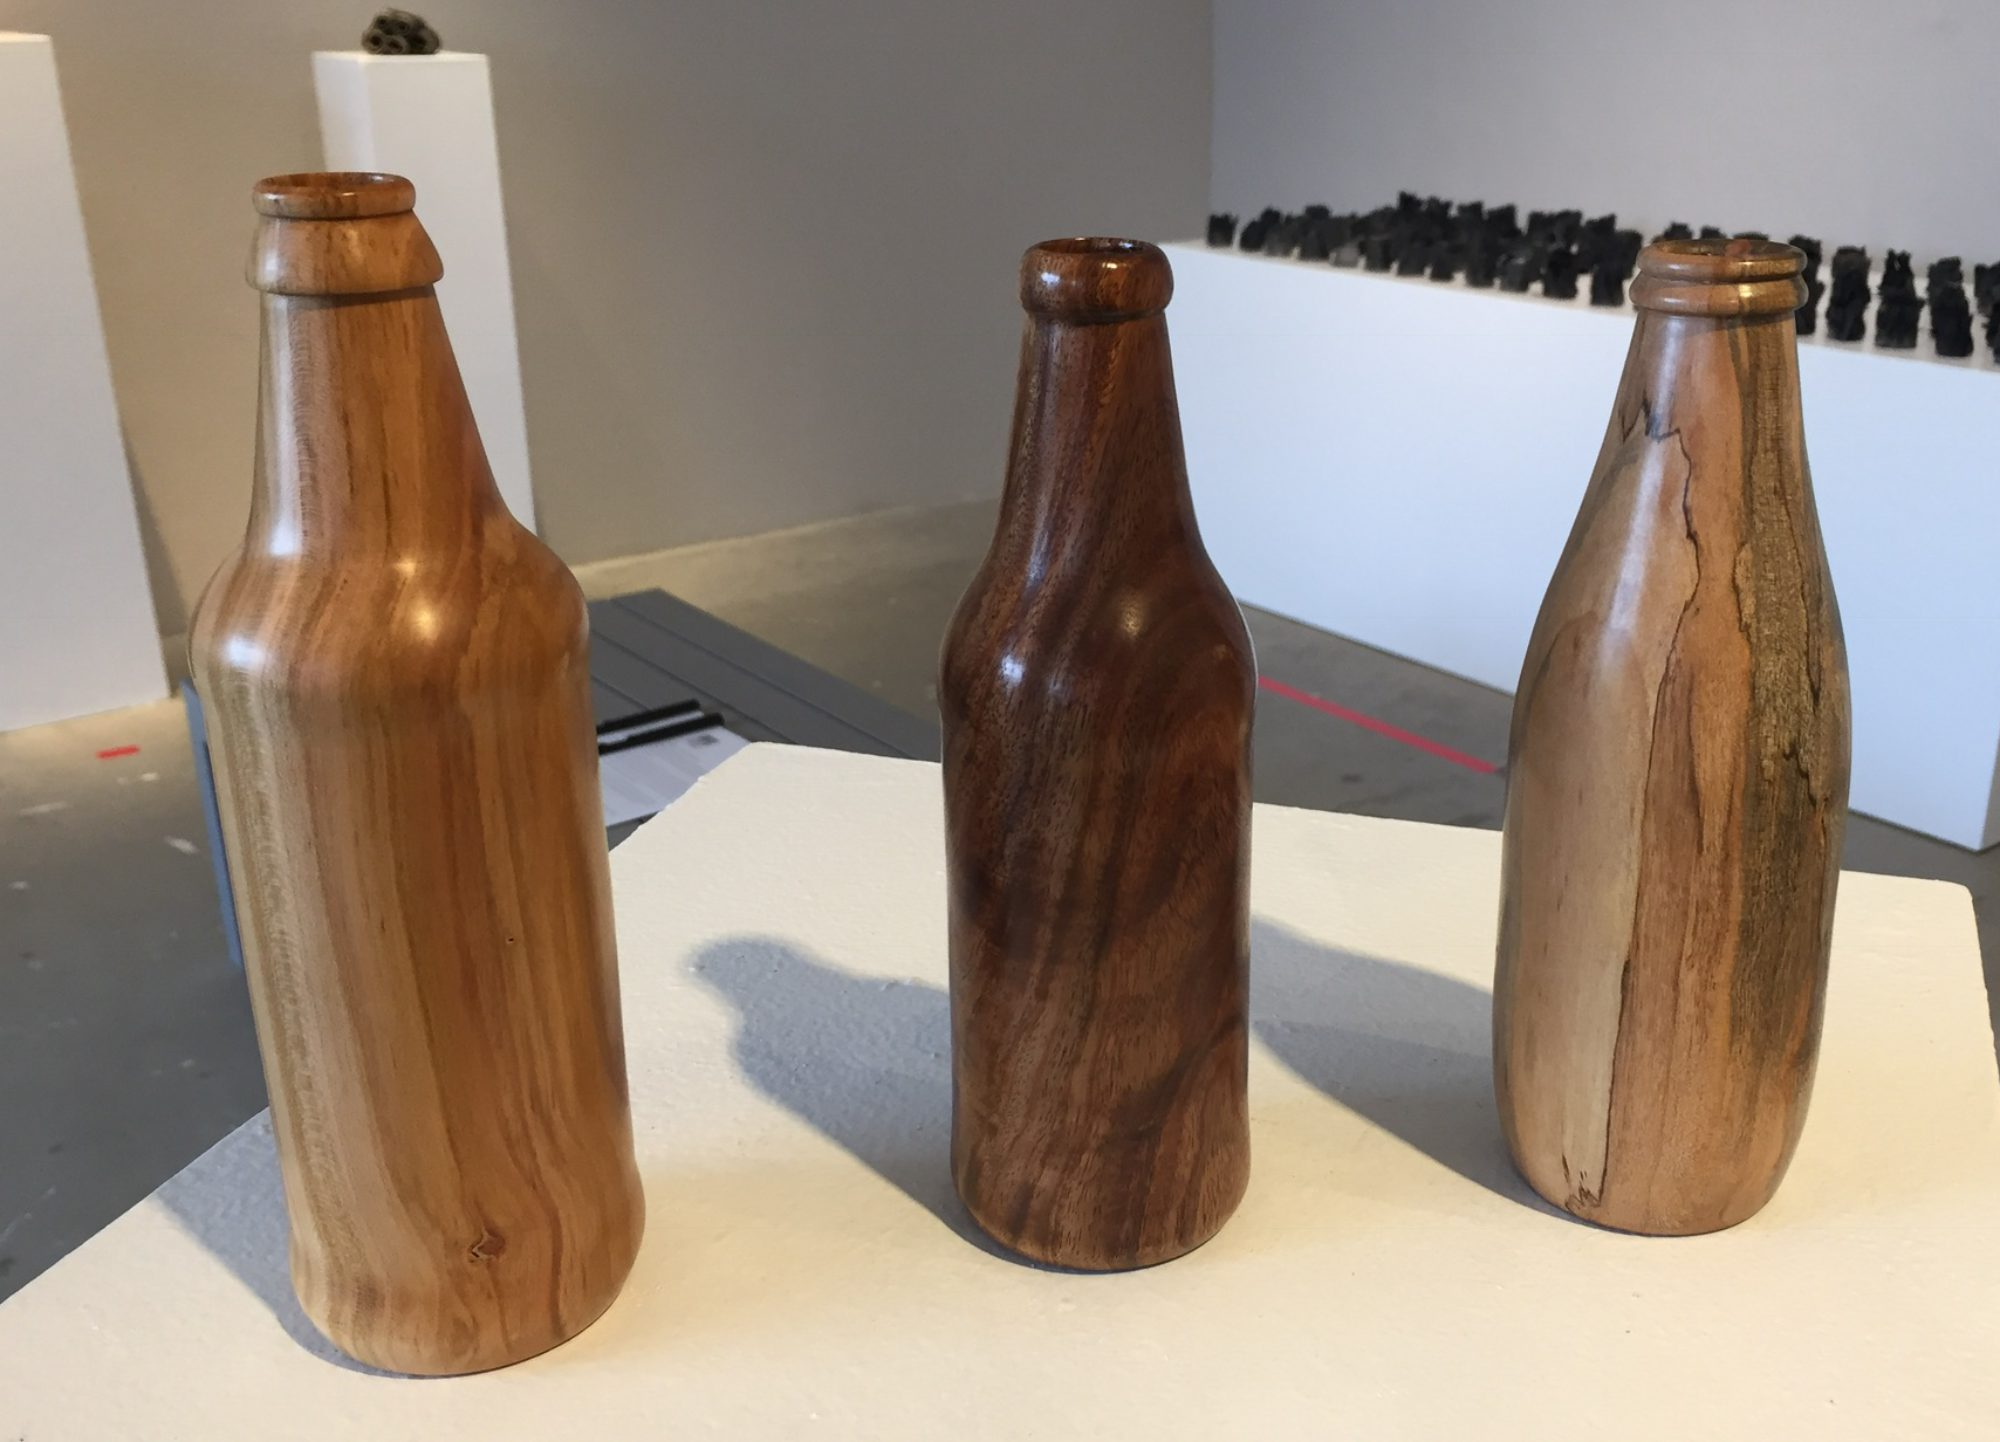 Dean Burris Woodworking